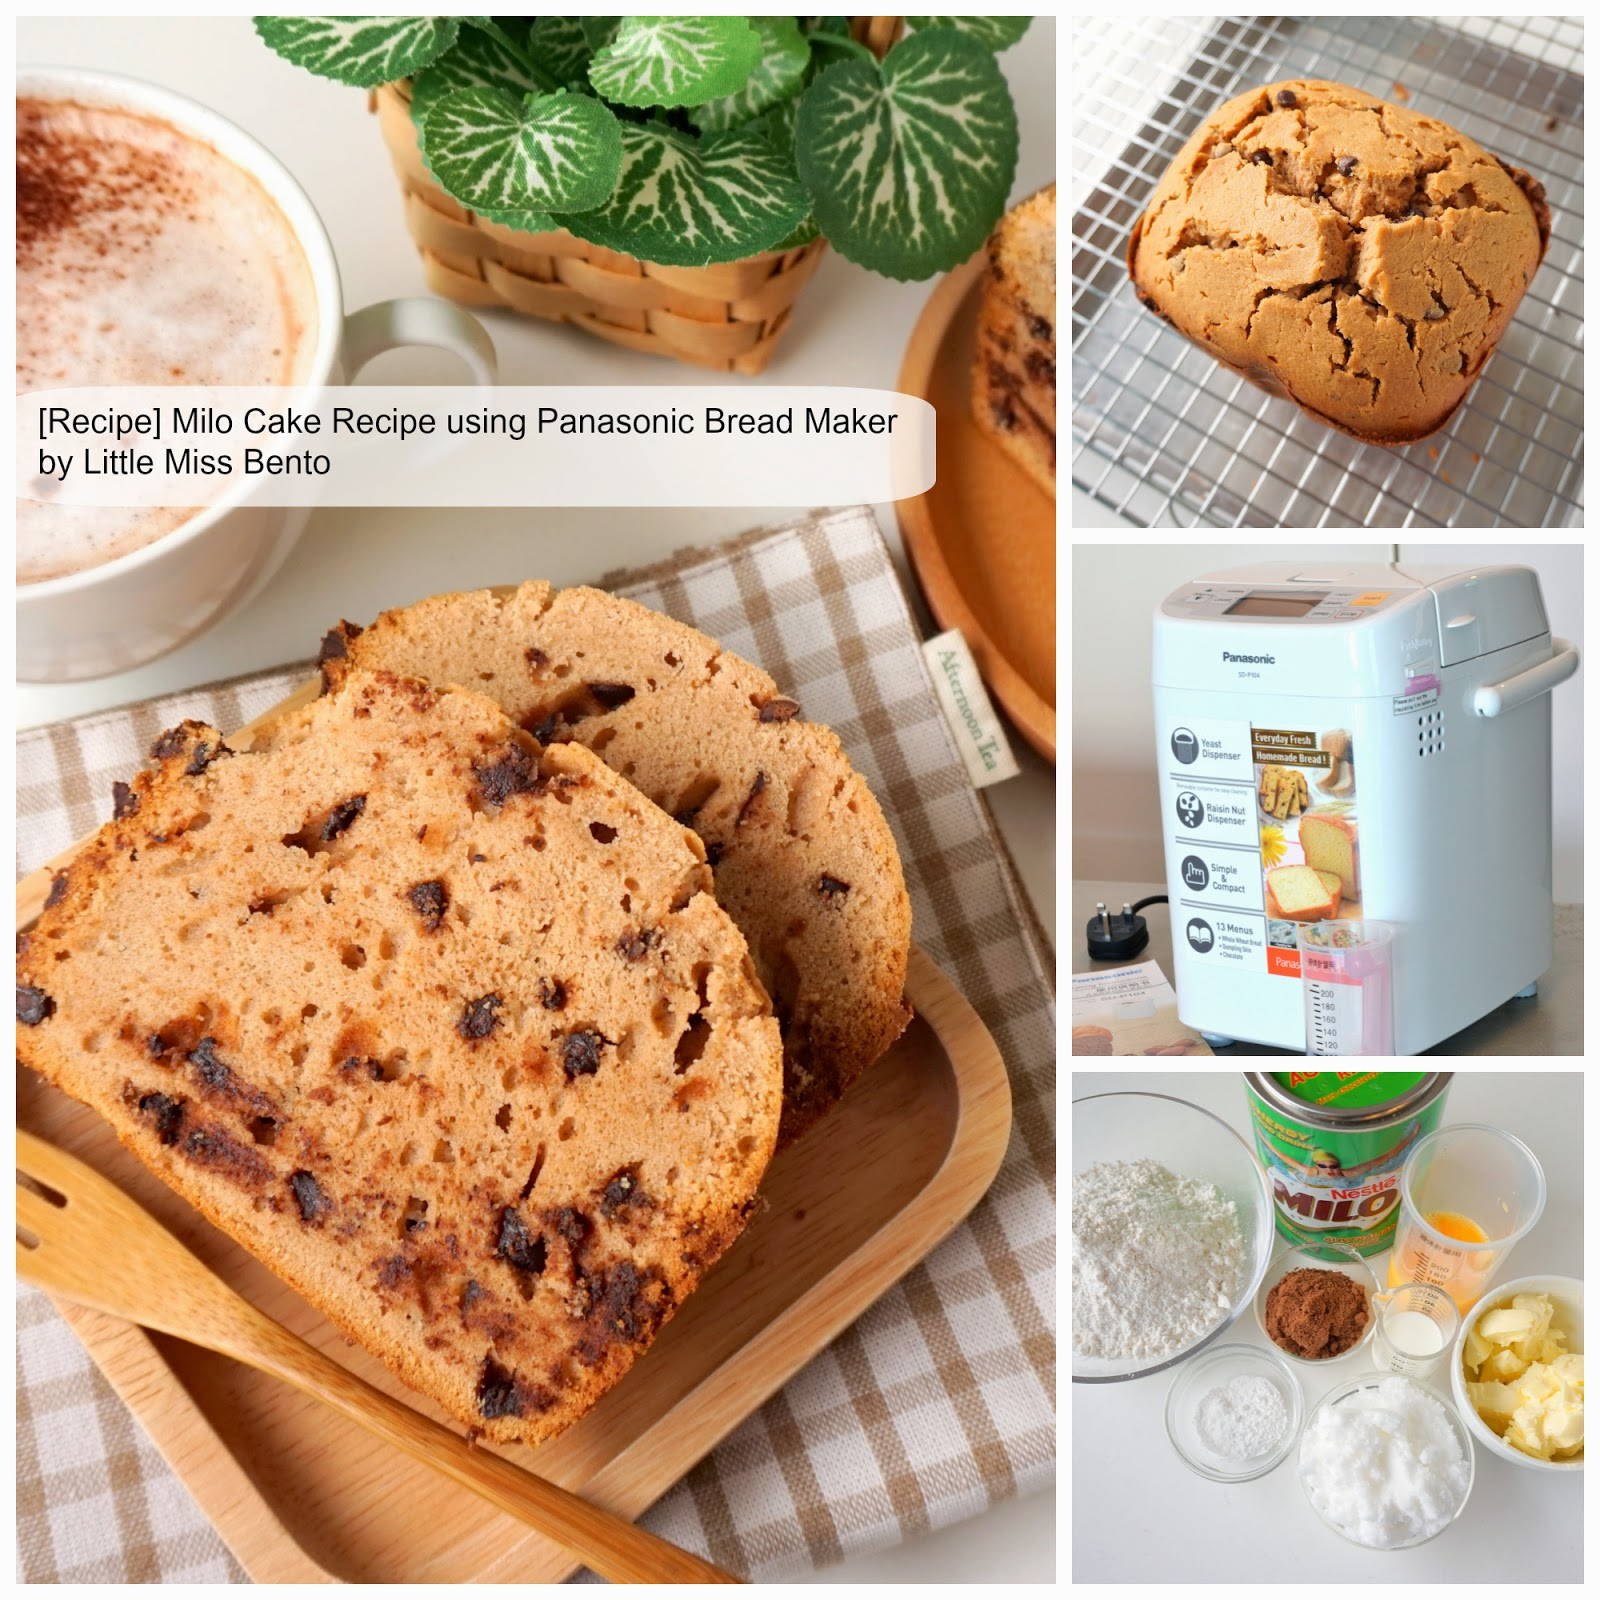 Panasonic Bread Maker Chocolate Cake Recipe